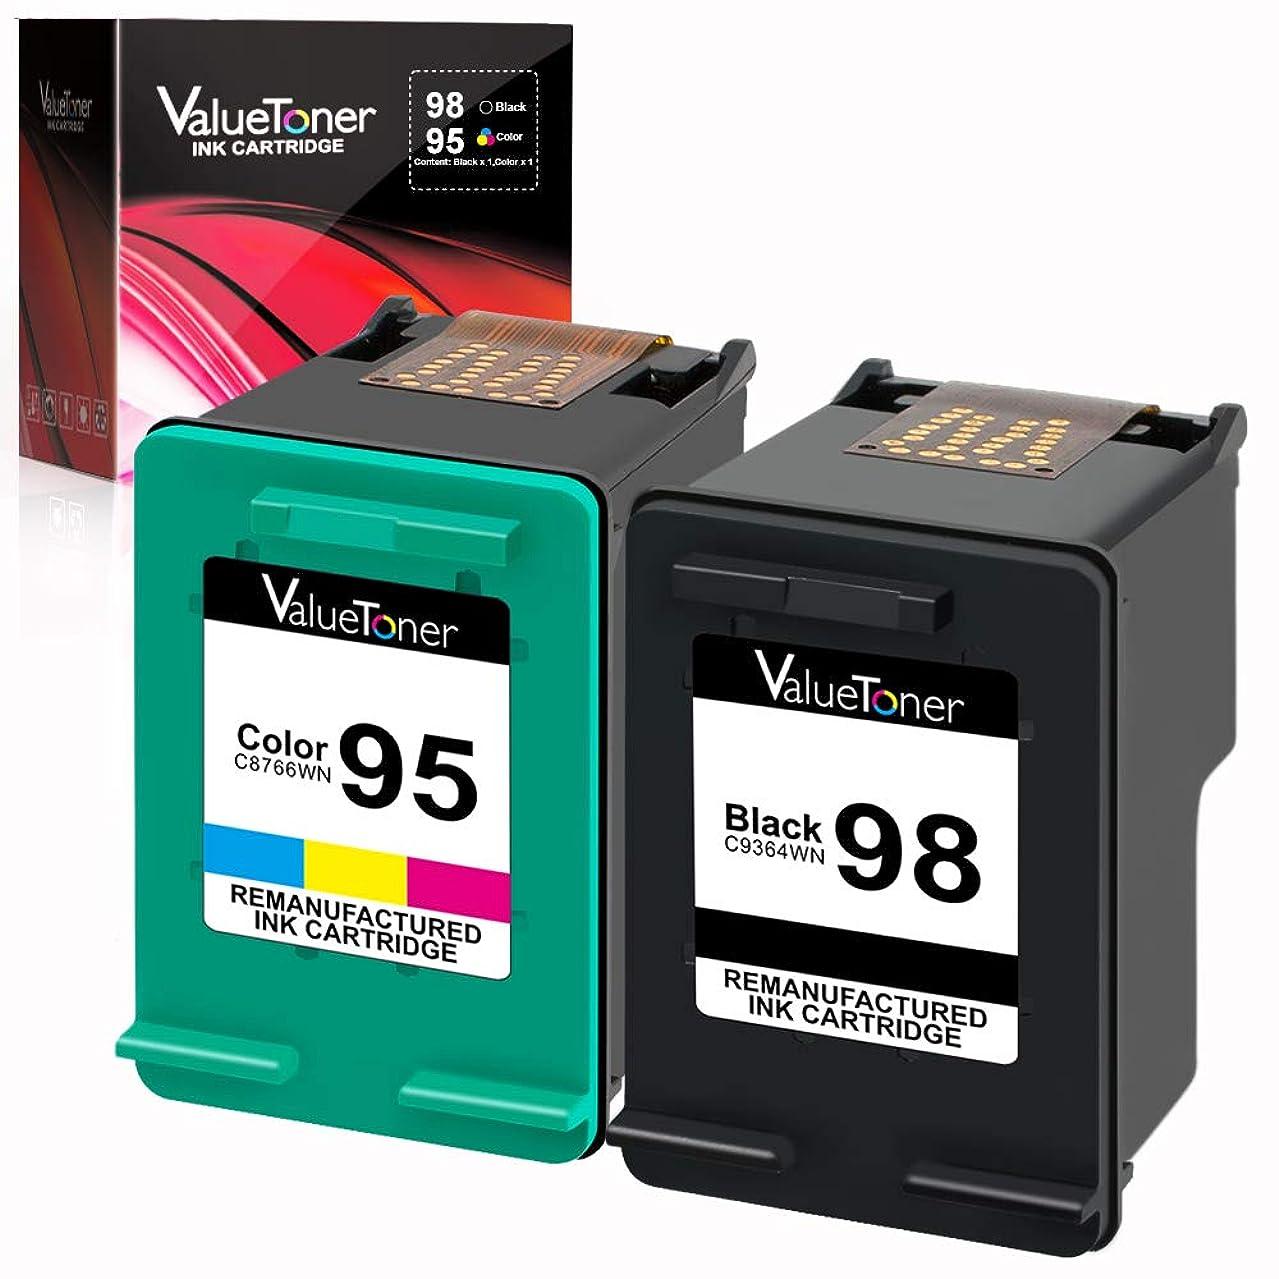 Valuetoner Remanufactured Ink Cartridge Replacement for HP 98 C9364WN & 95 C8766WN for Officejet 150 100 6310, PhotoSmart 8050 C4180 C4150, Deskjet 460 5940 Printer (1 Black, 1 Tri-Color, 2 Pack)